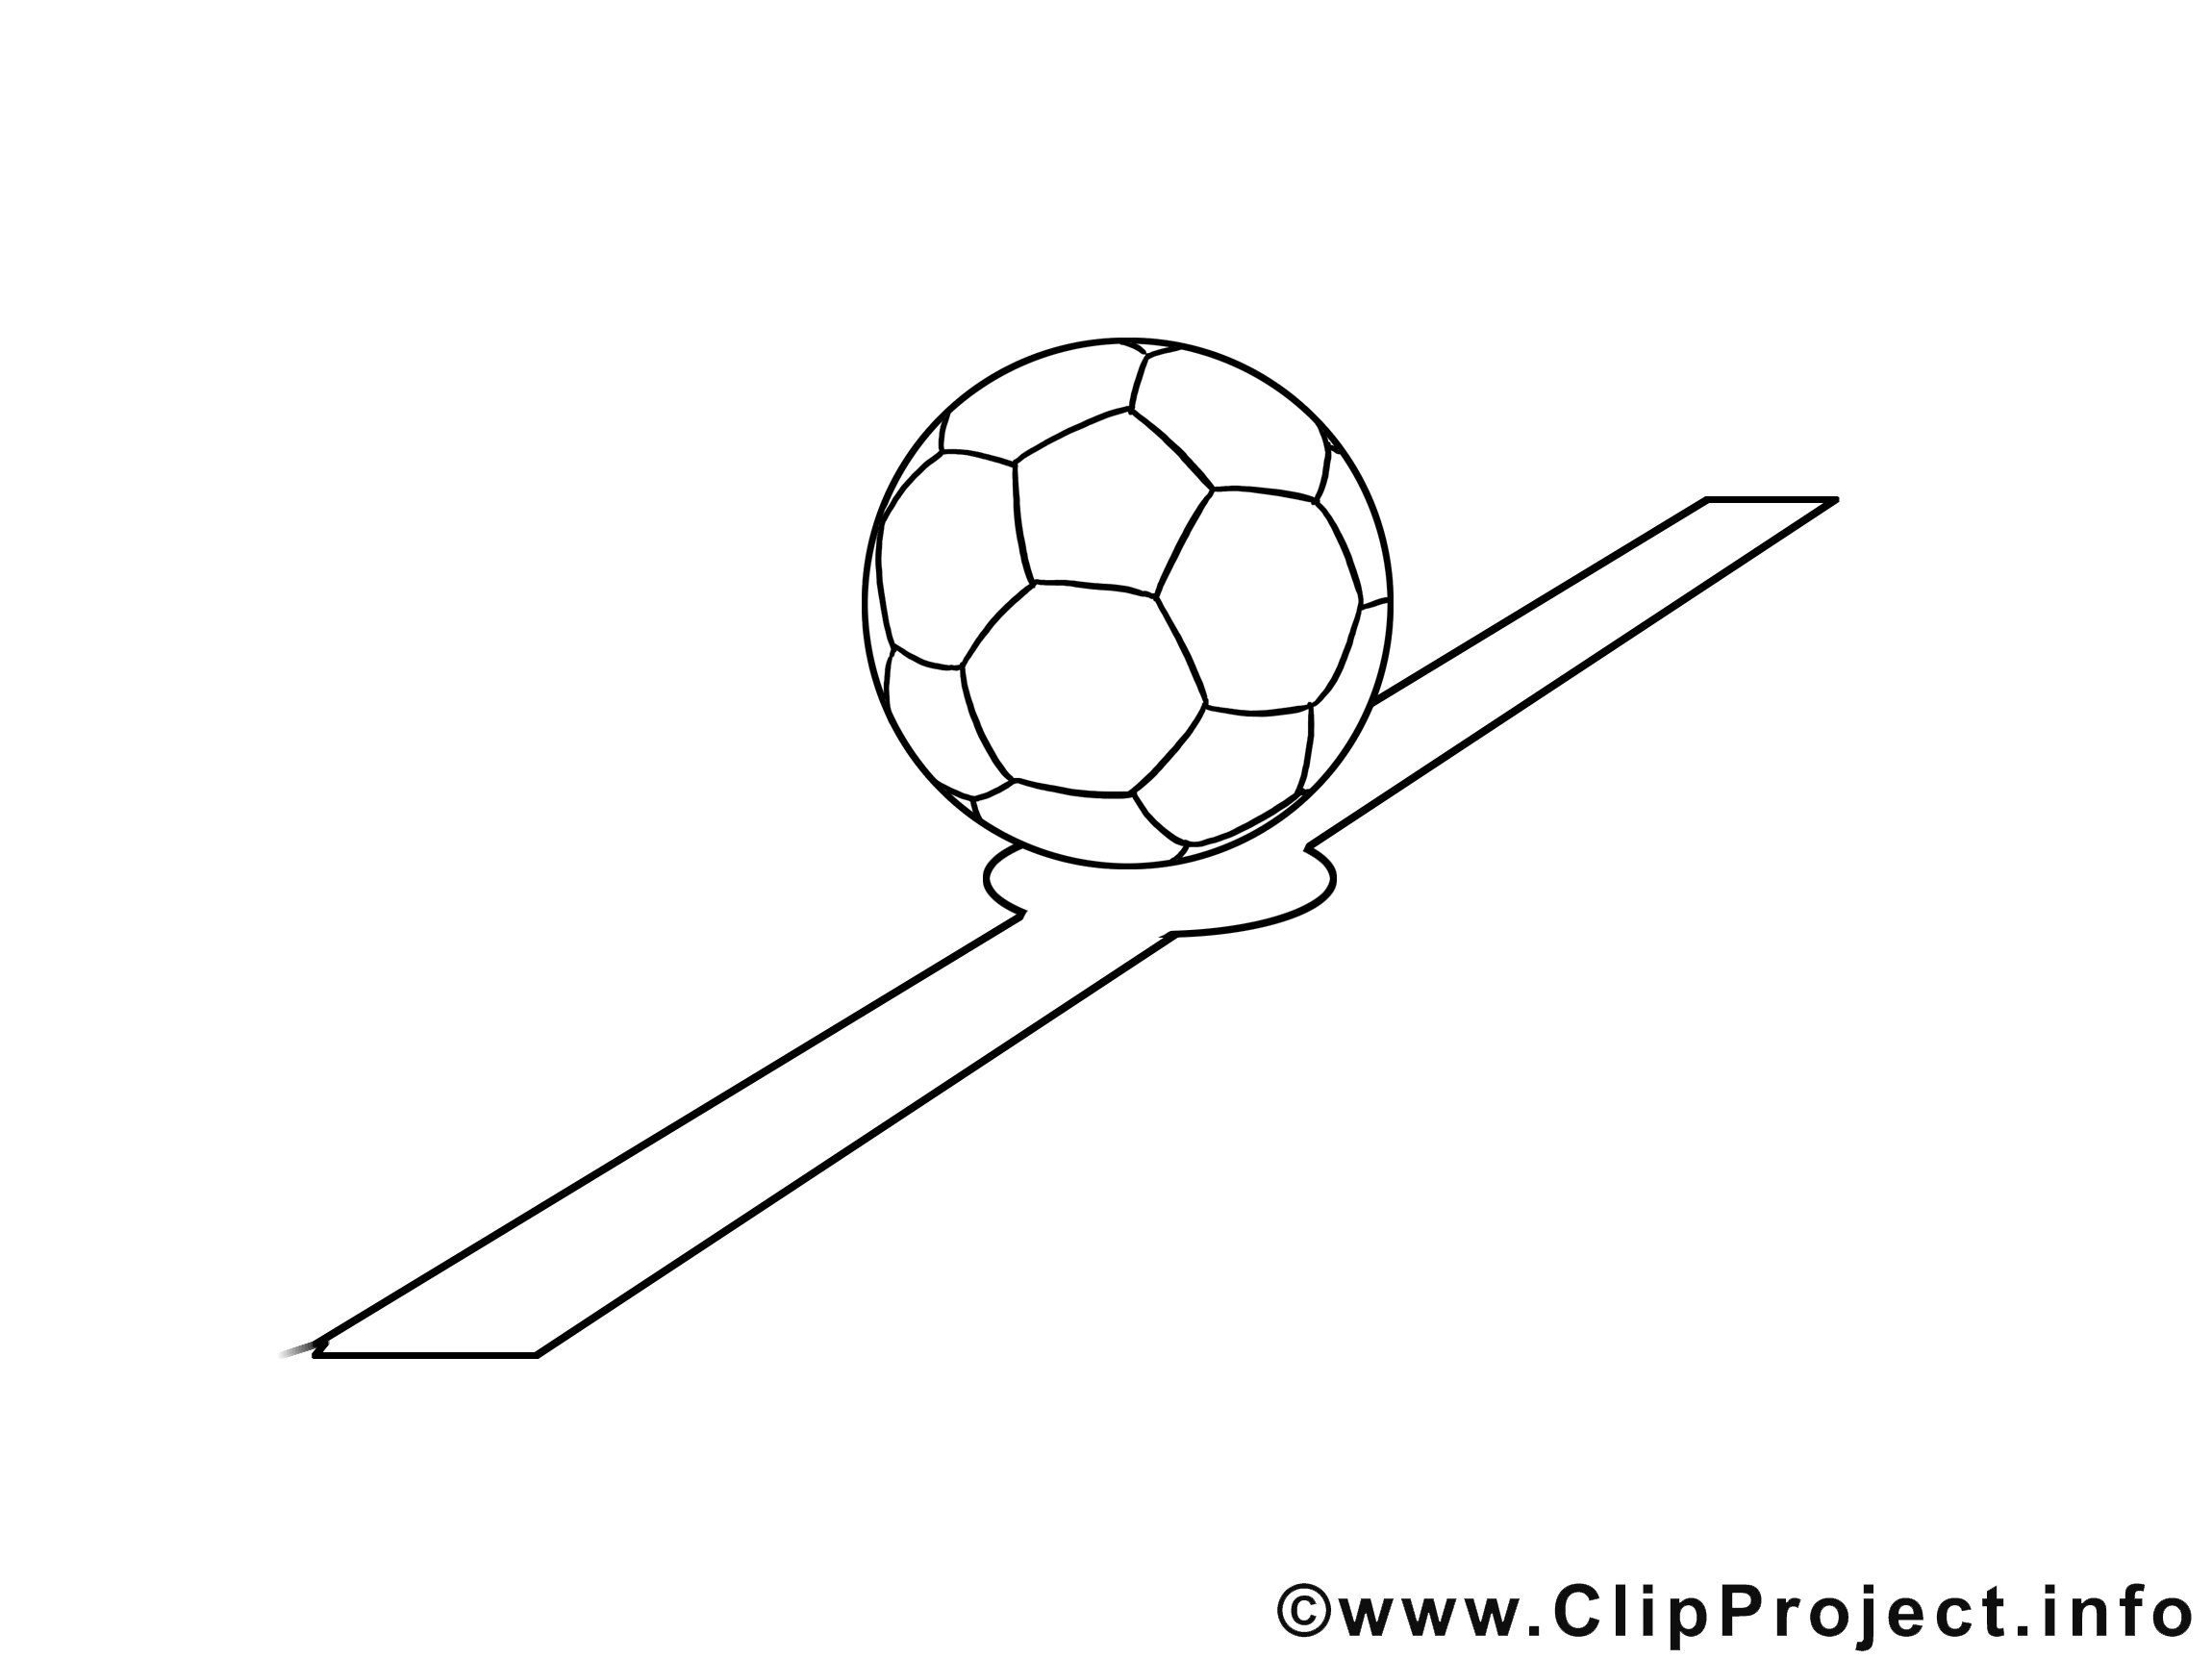 Ligne dessin – Football gratuits à imprimer